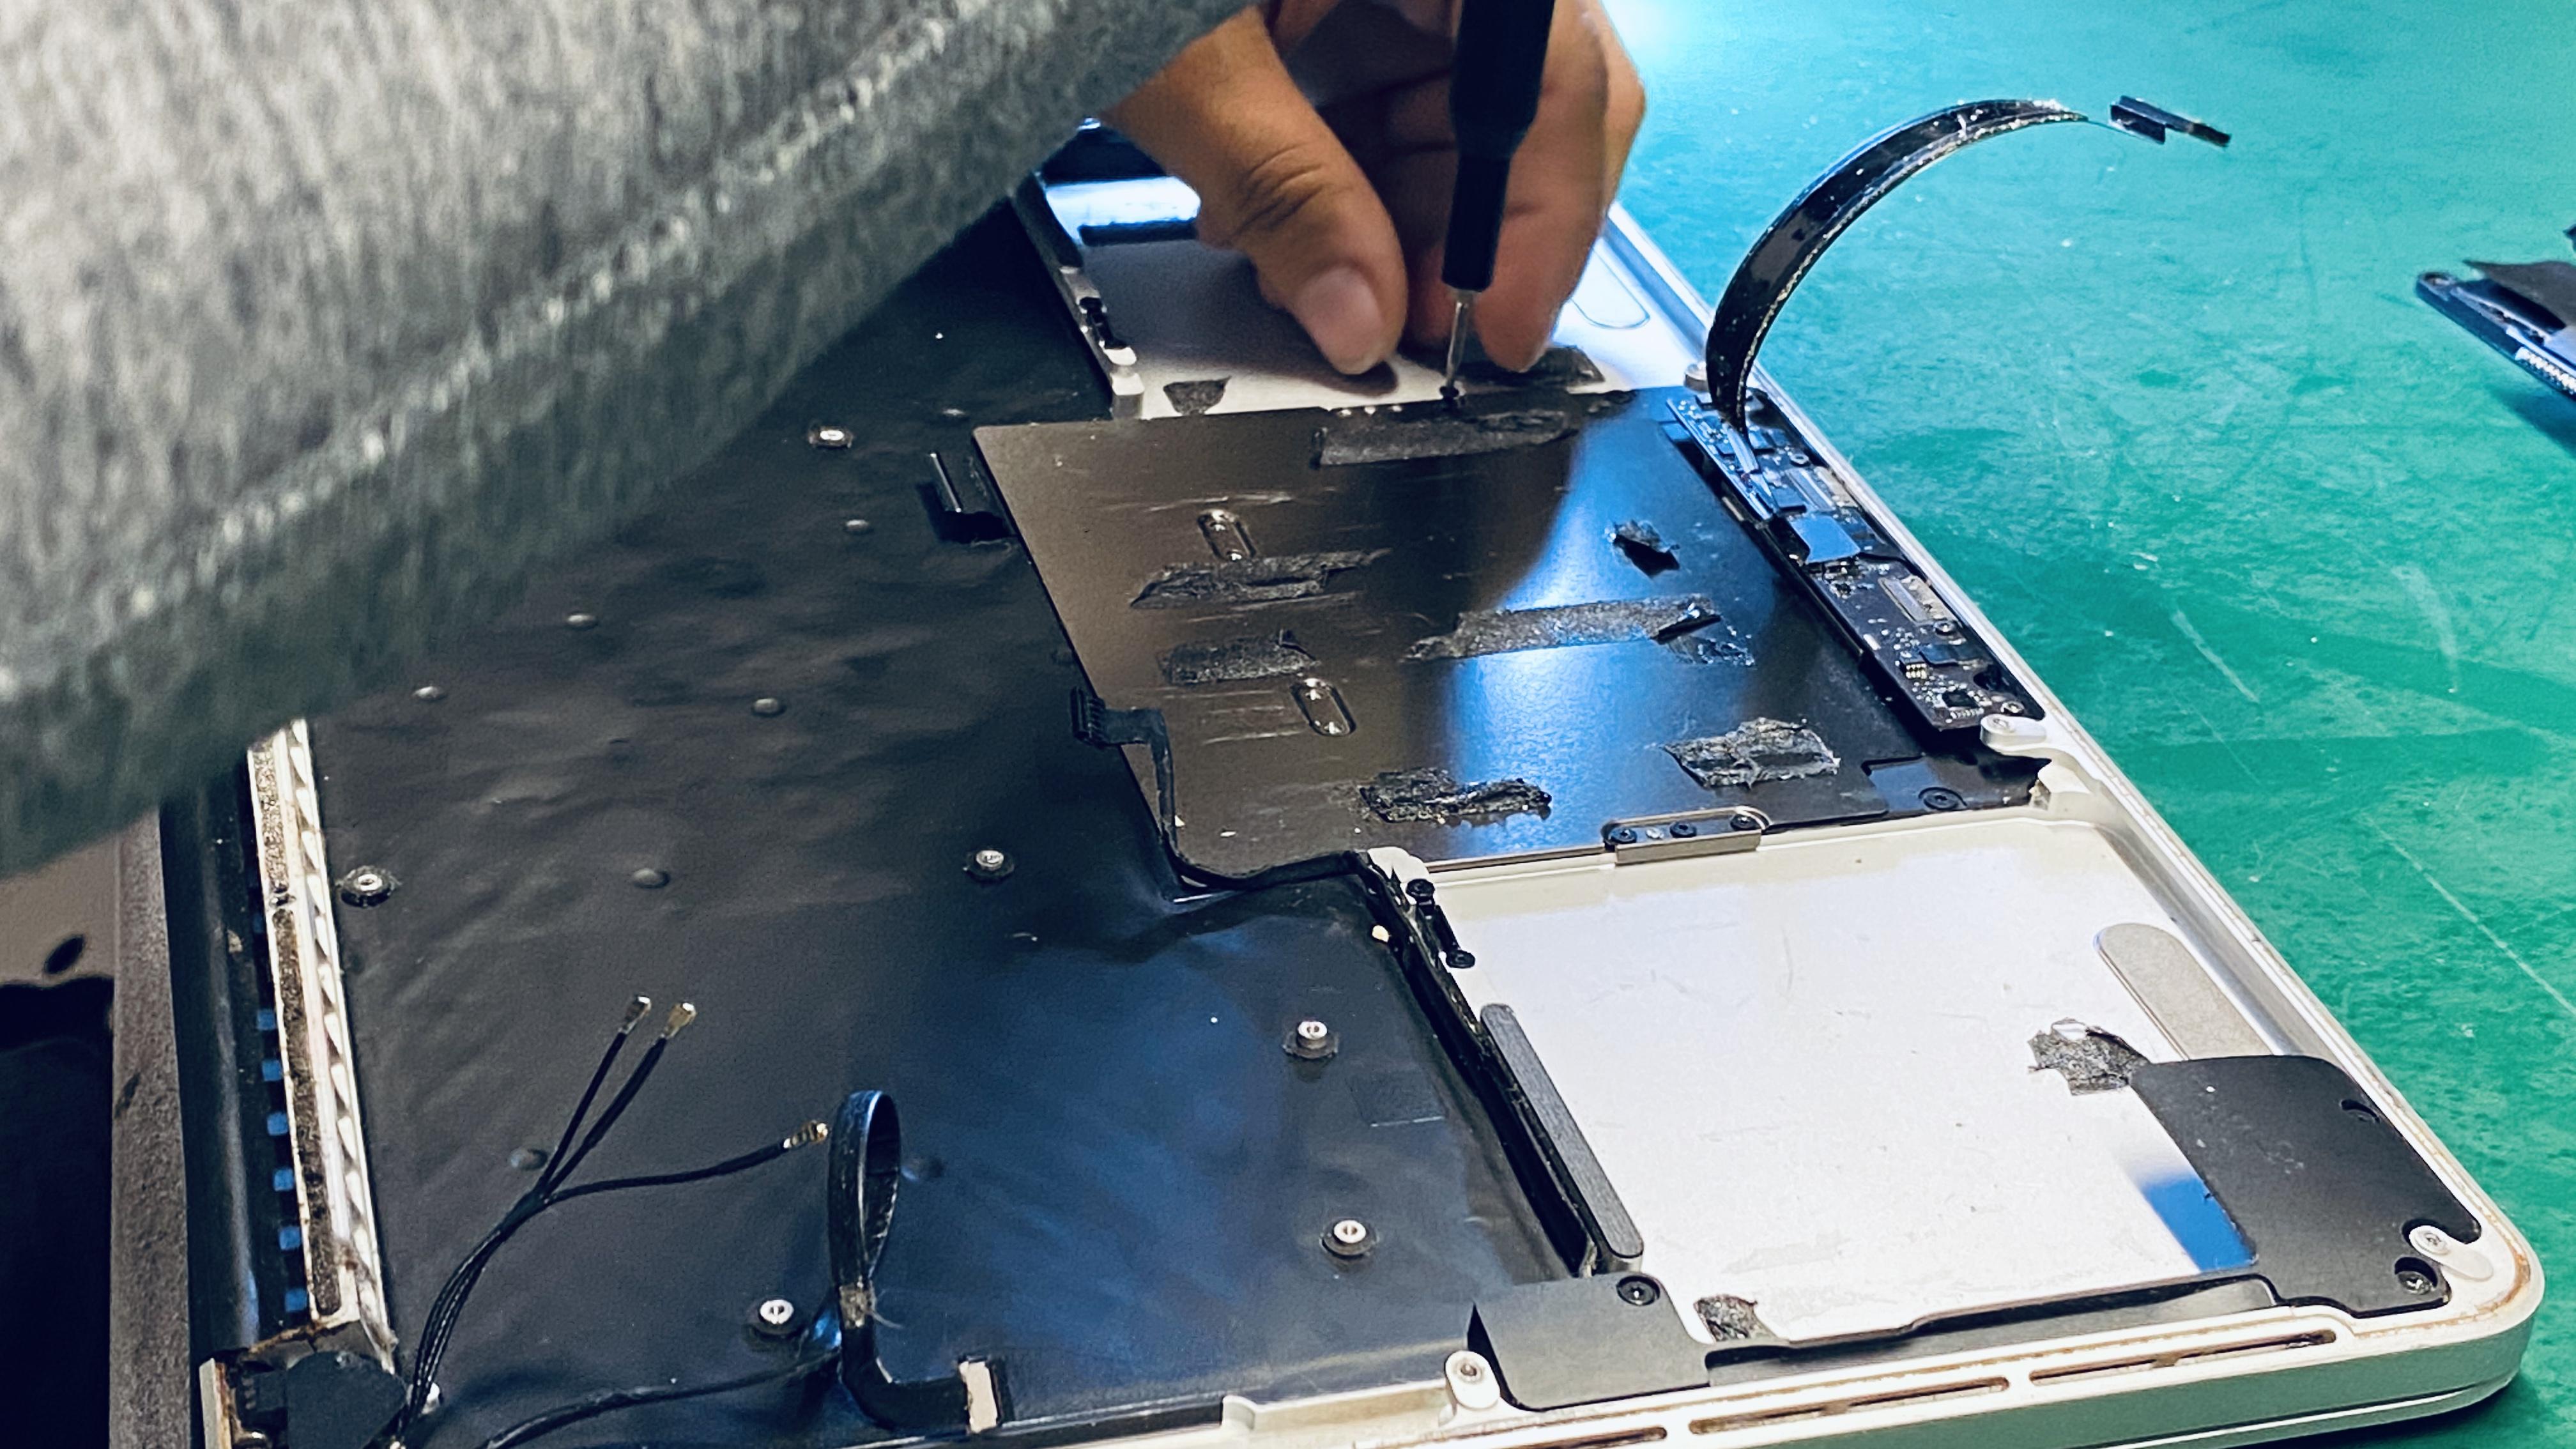 slow macbook repair service frisco